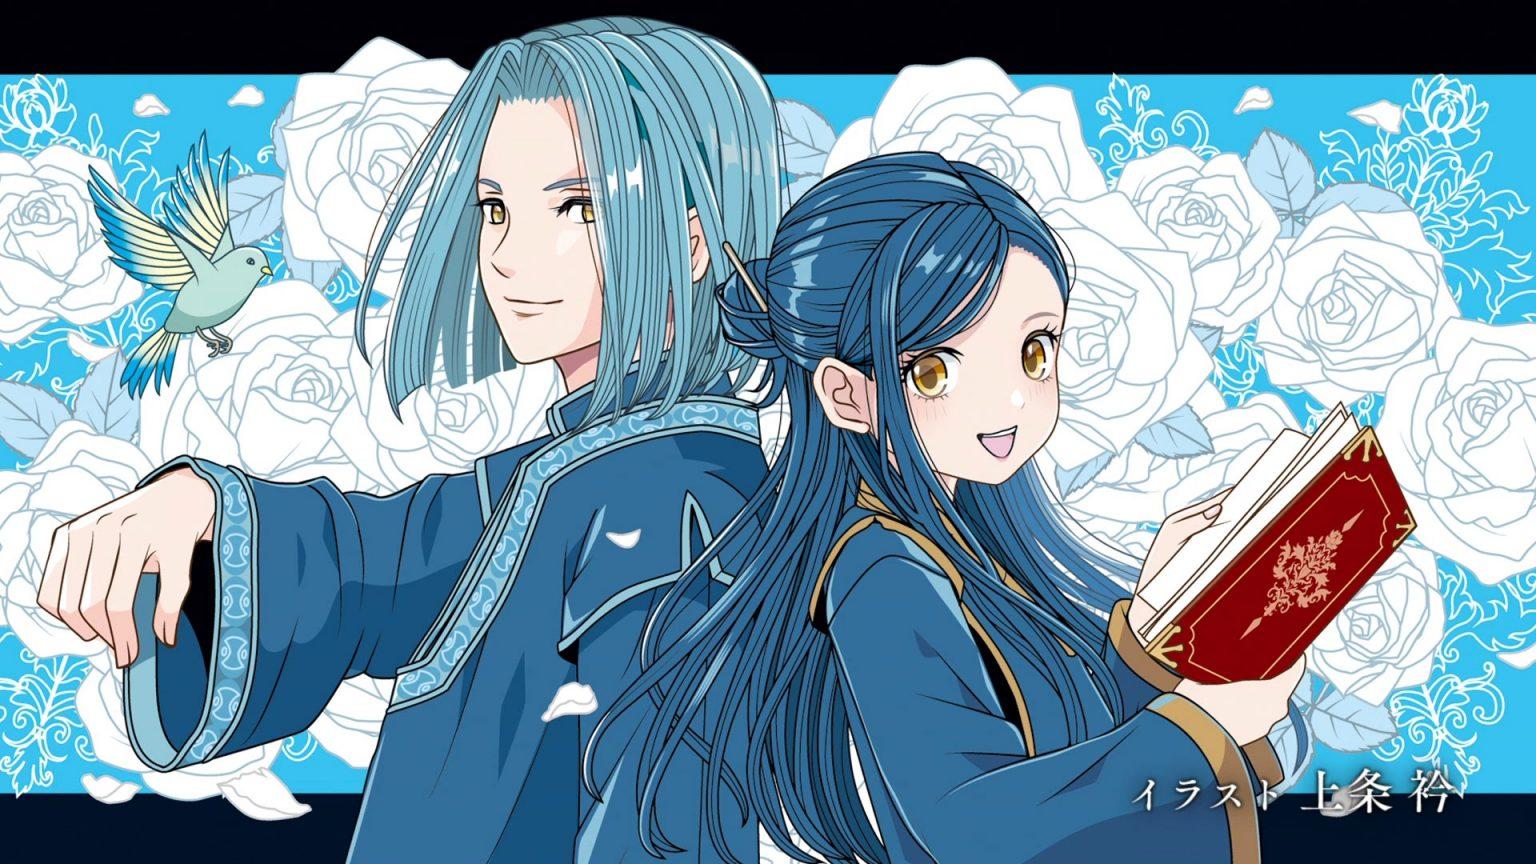 Ascendance of a Bookworm Episode 15 Endcard Eri Kamijou